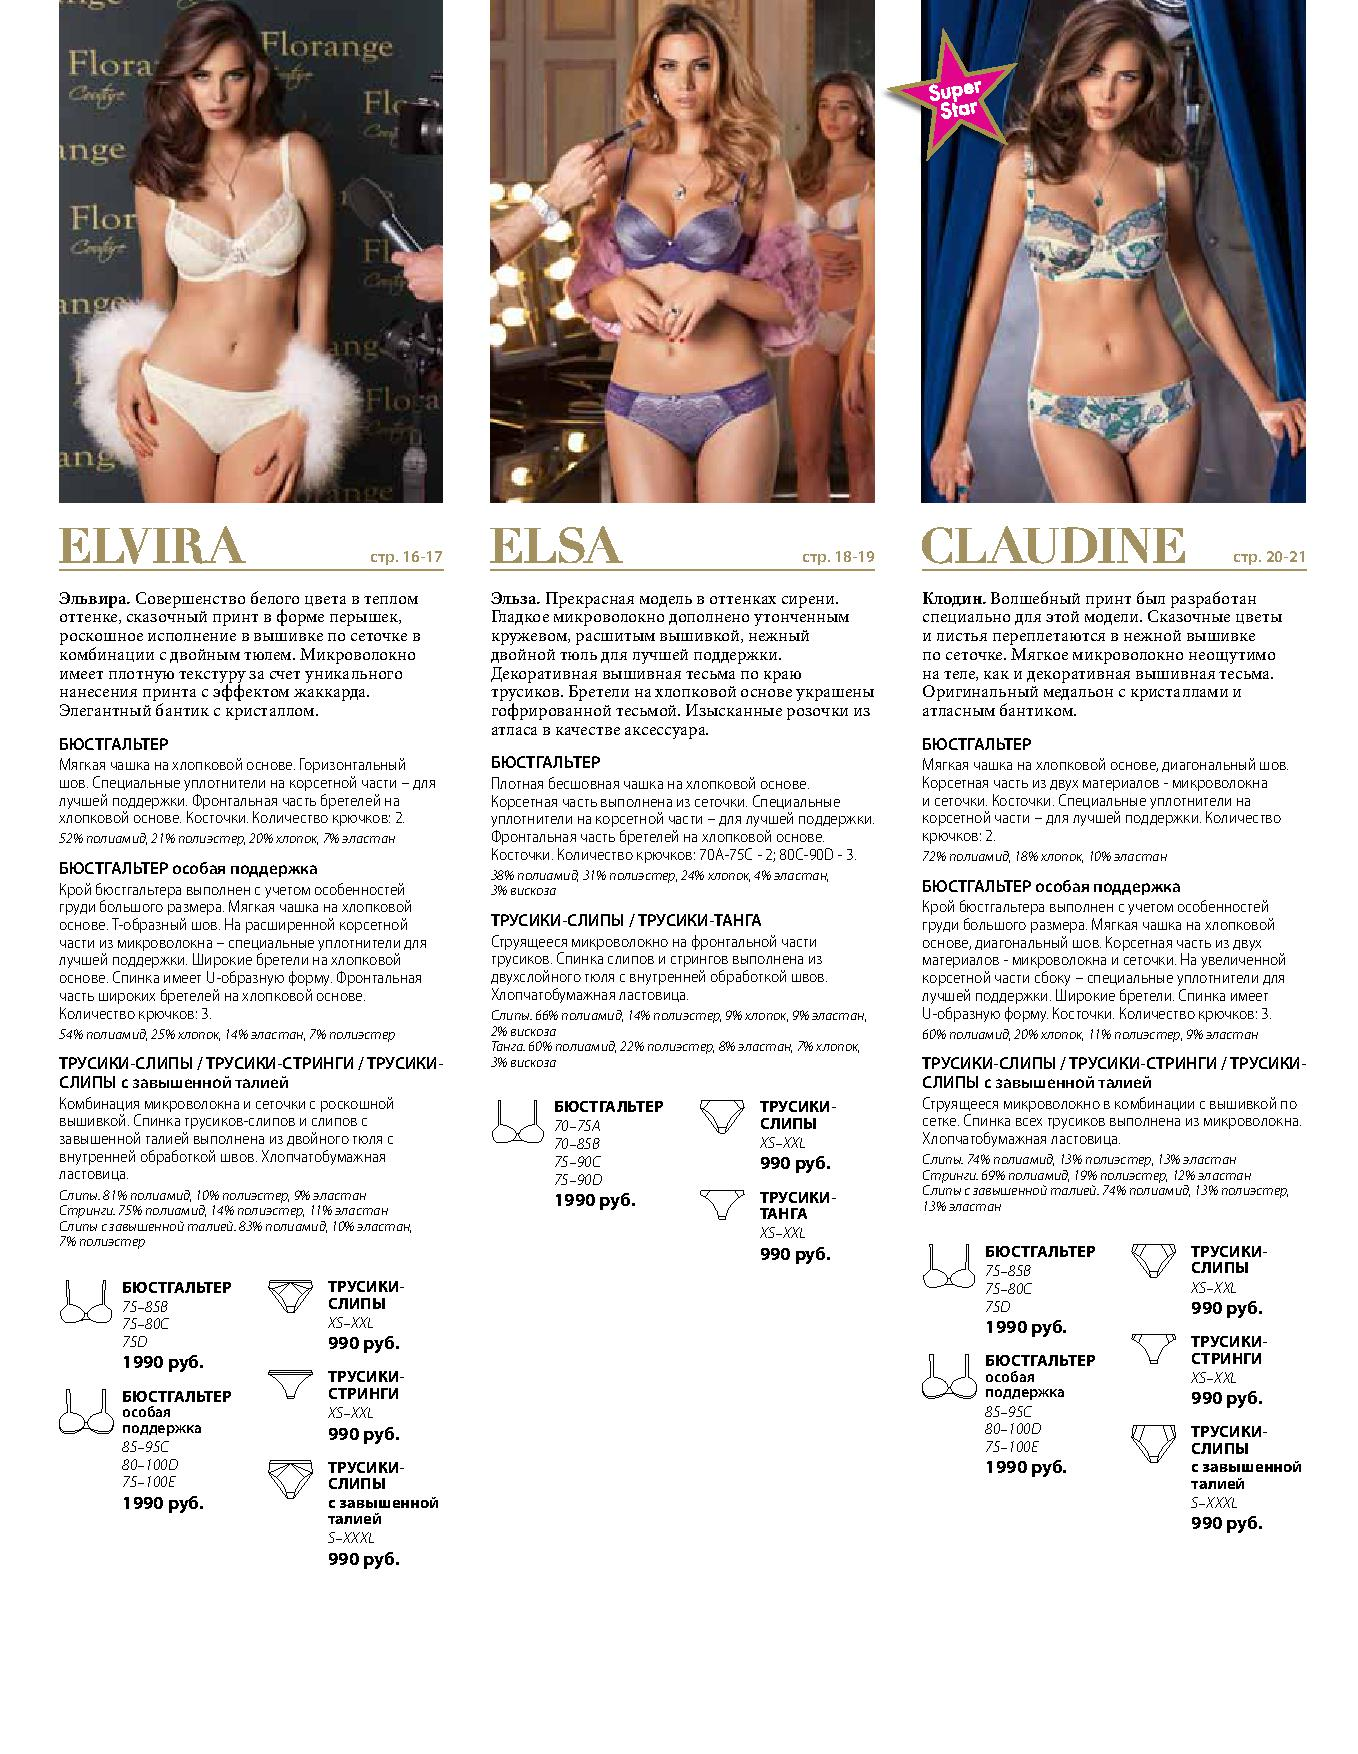 Описание комплектов каталога стр. 16-21